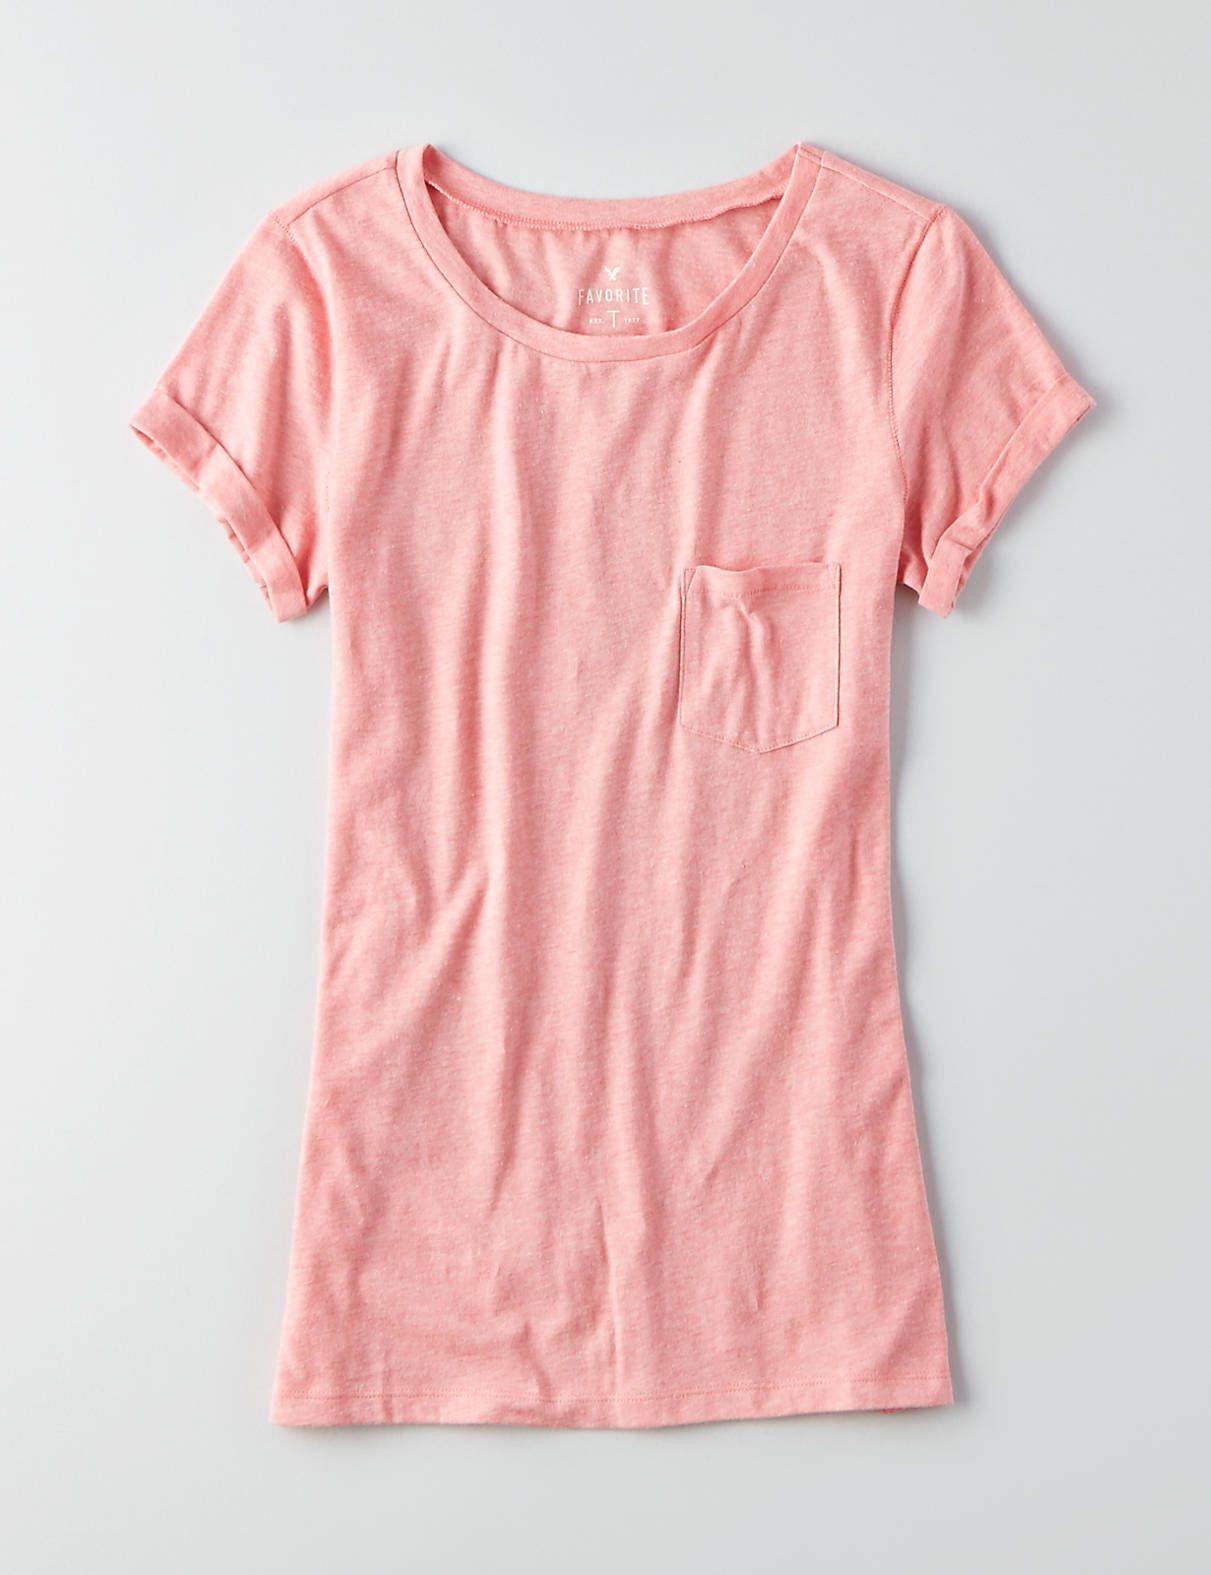 American Outfitters CAMISETAS Y TOPS - Sudaderas eKcw1